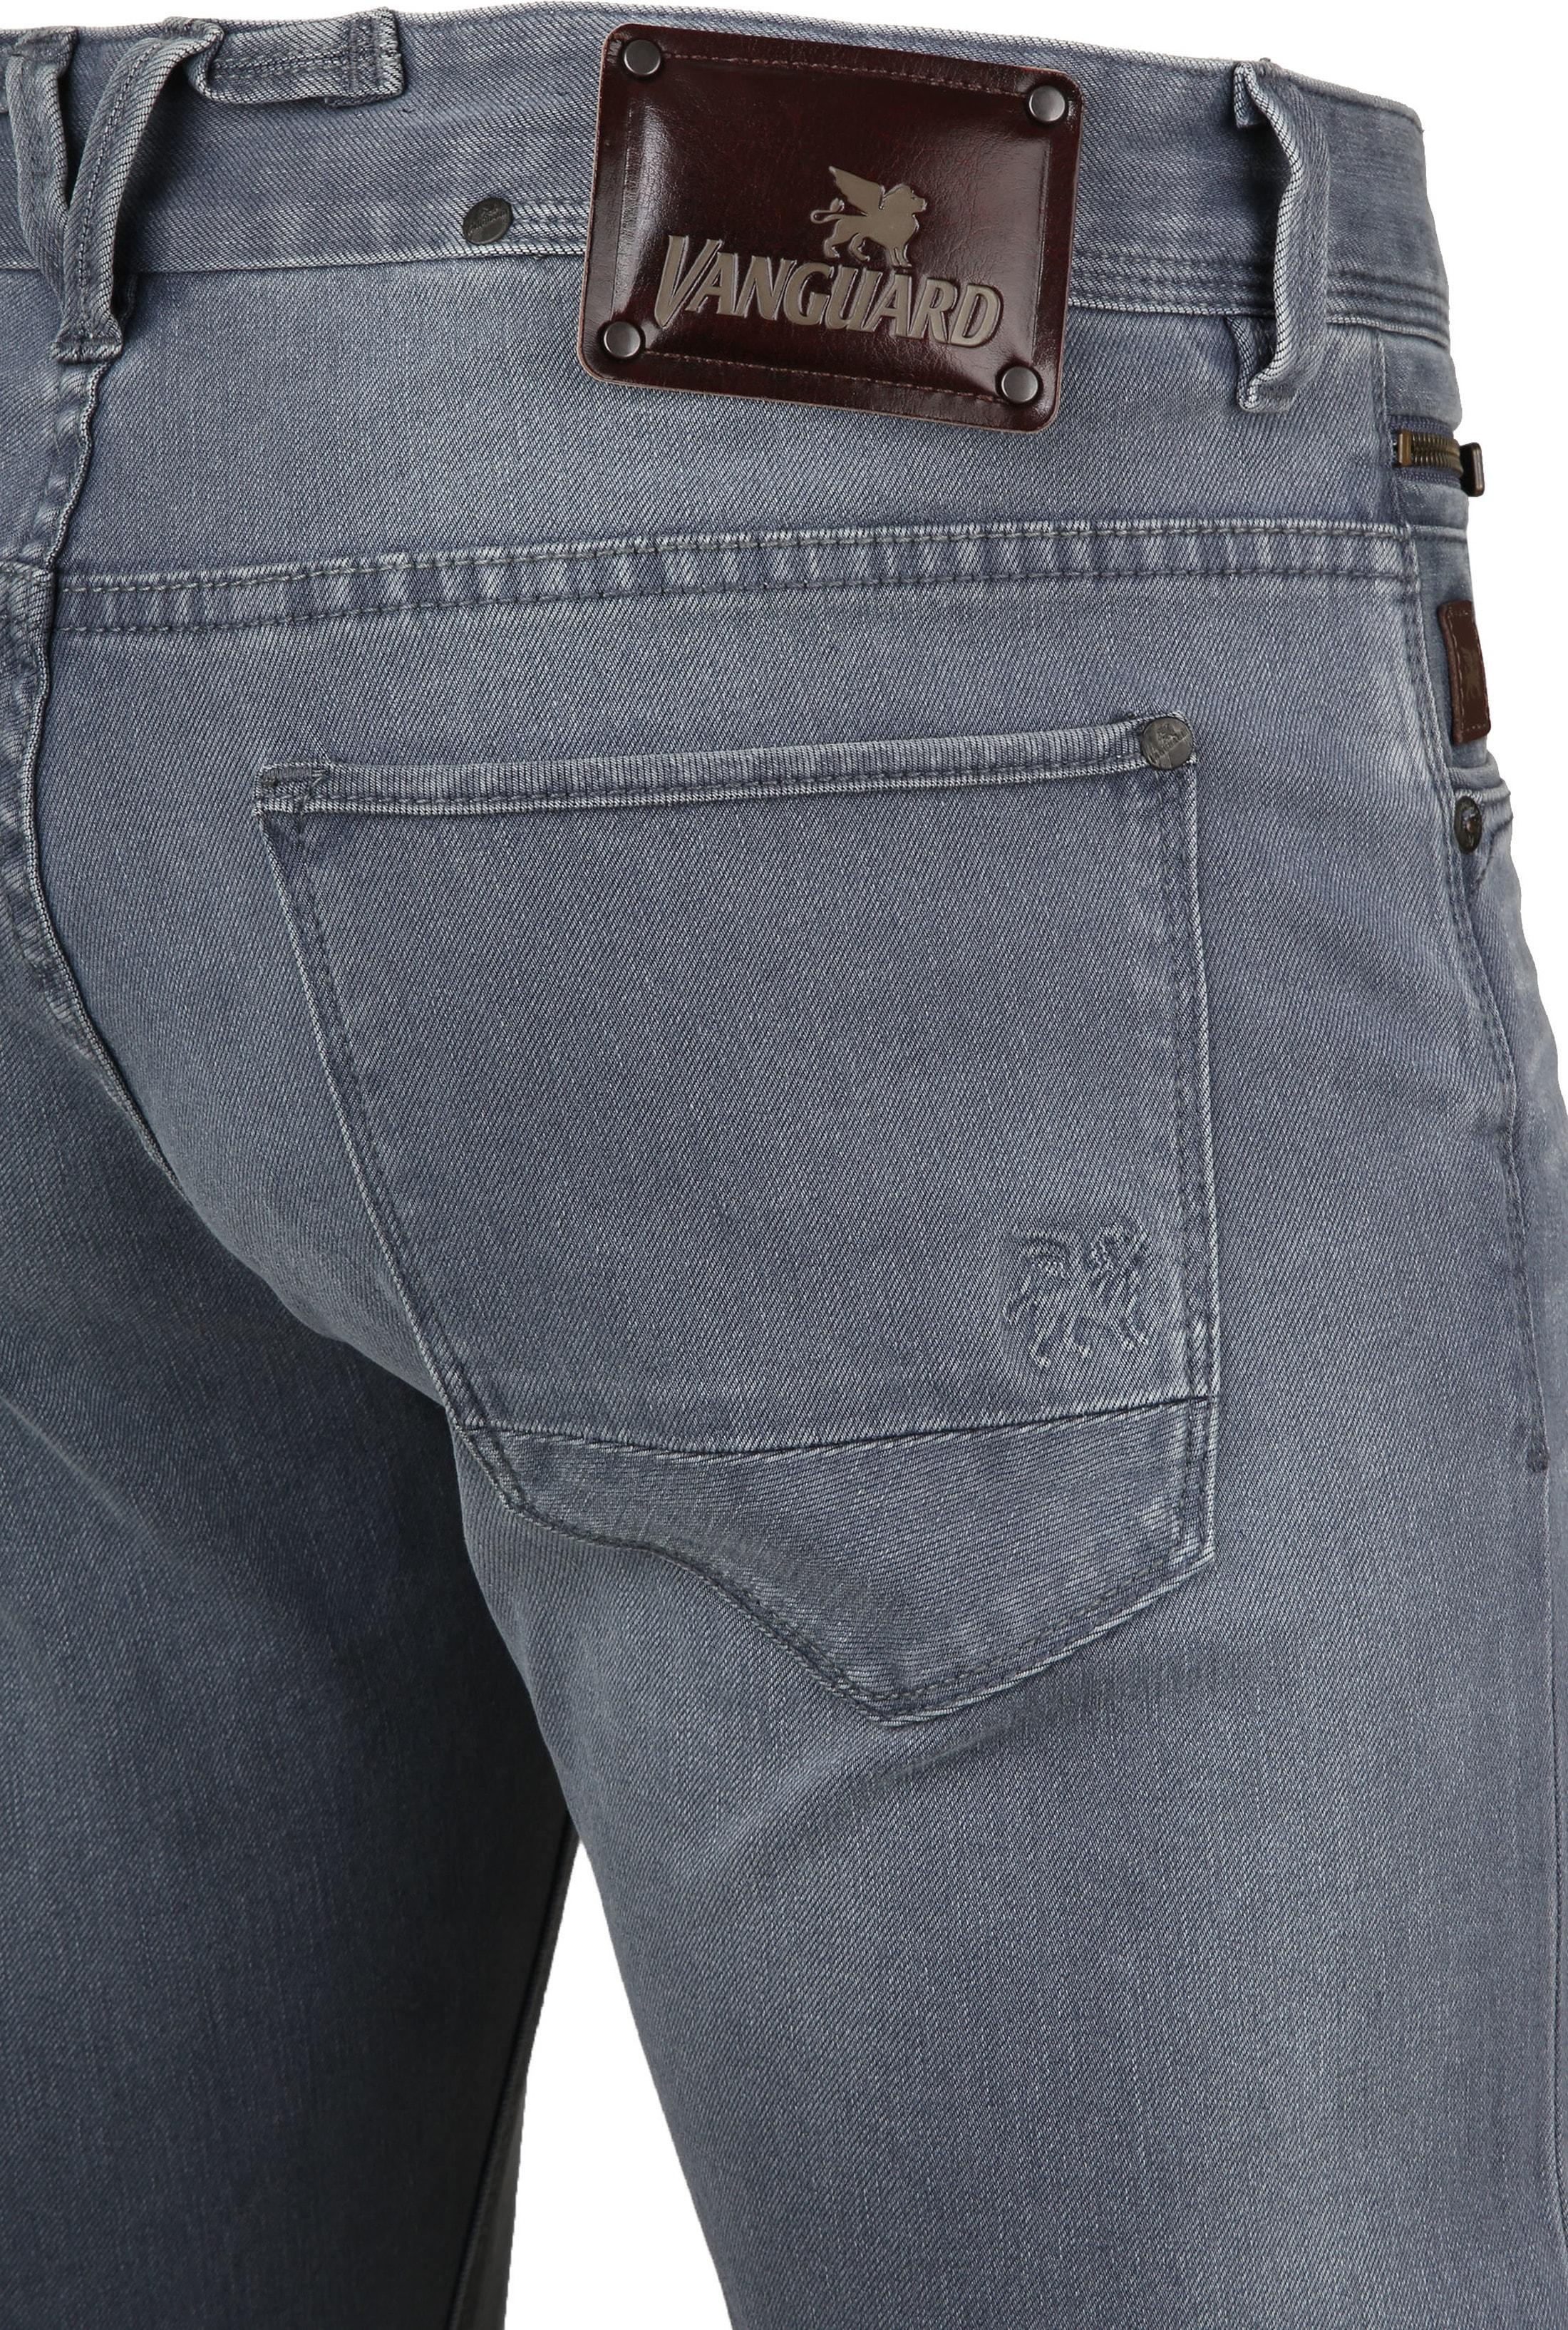 Vanguard V850 Rider Grau Jeans foto 1